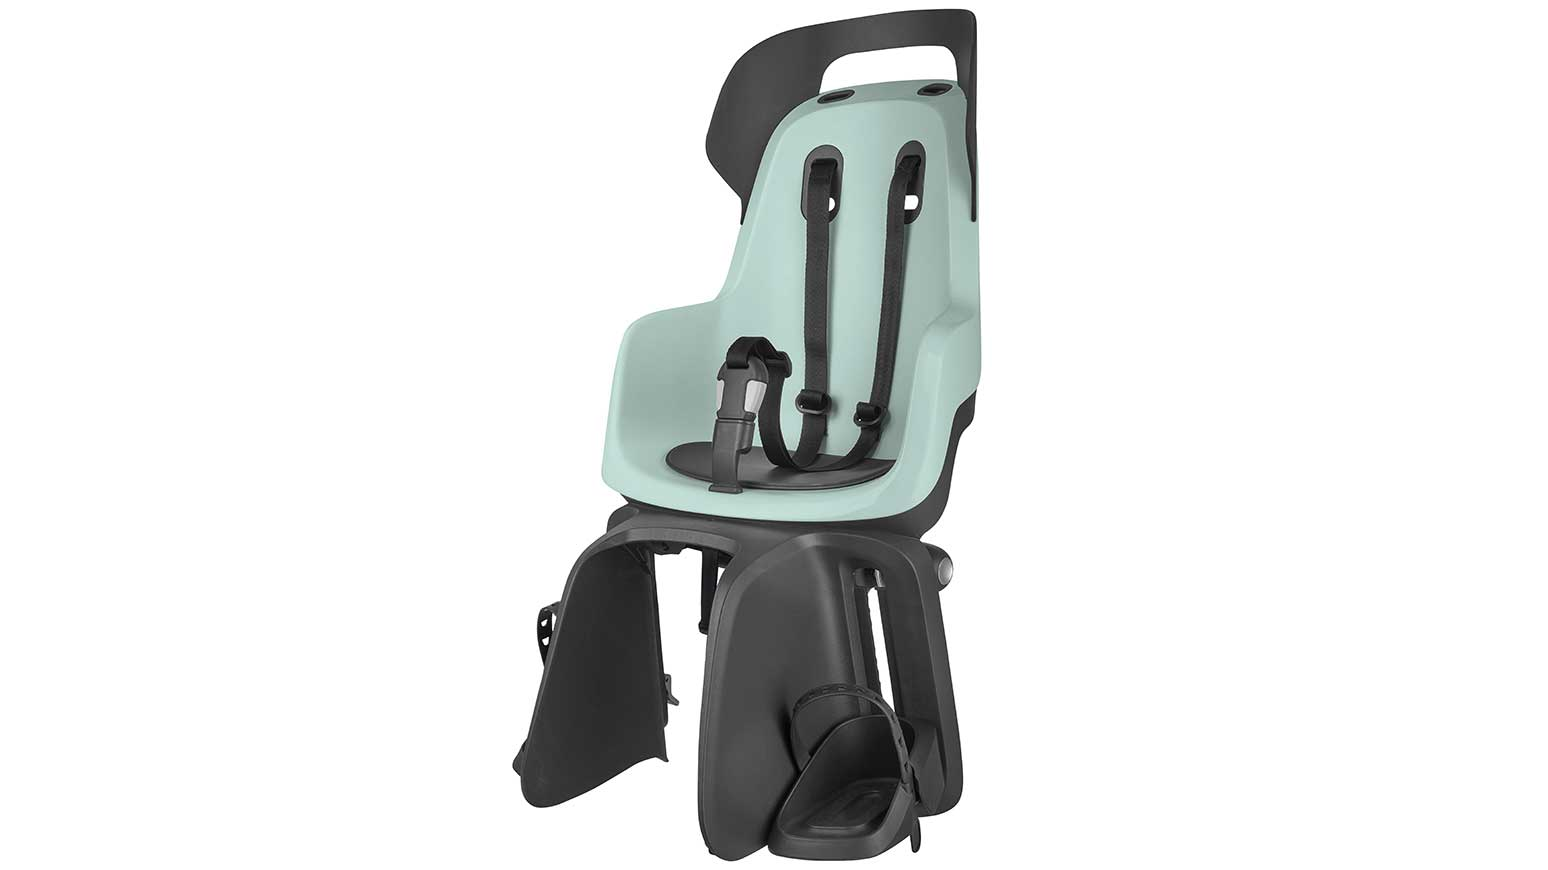 Der neue Kindersitz Bobike GO in zartem Grün.